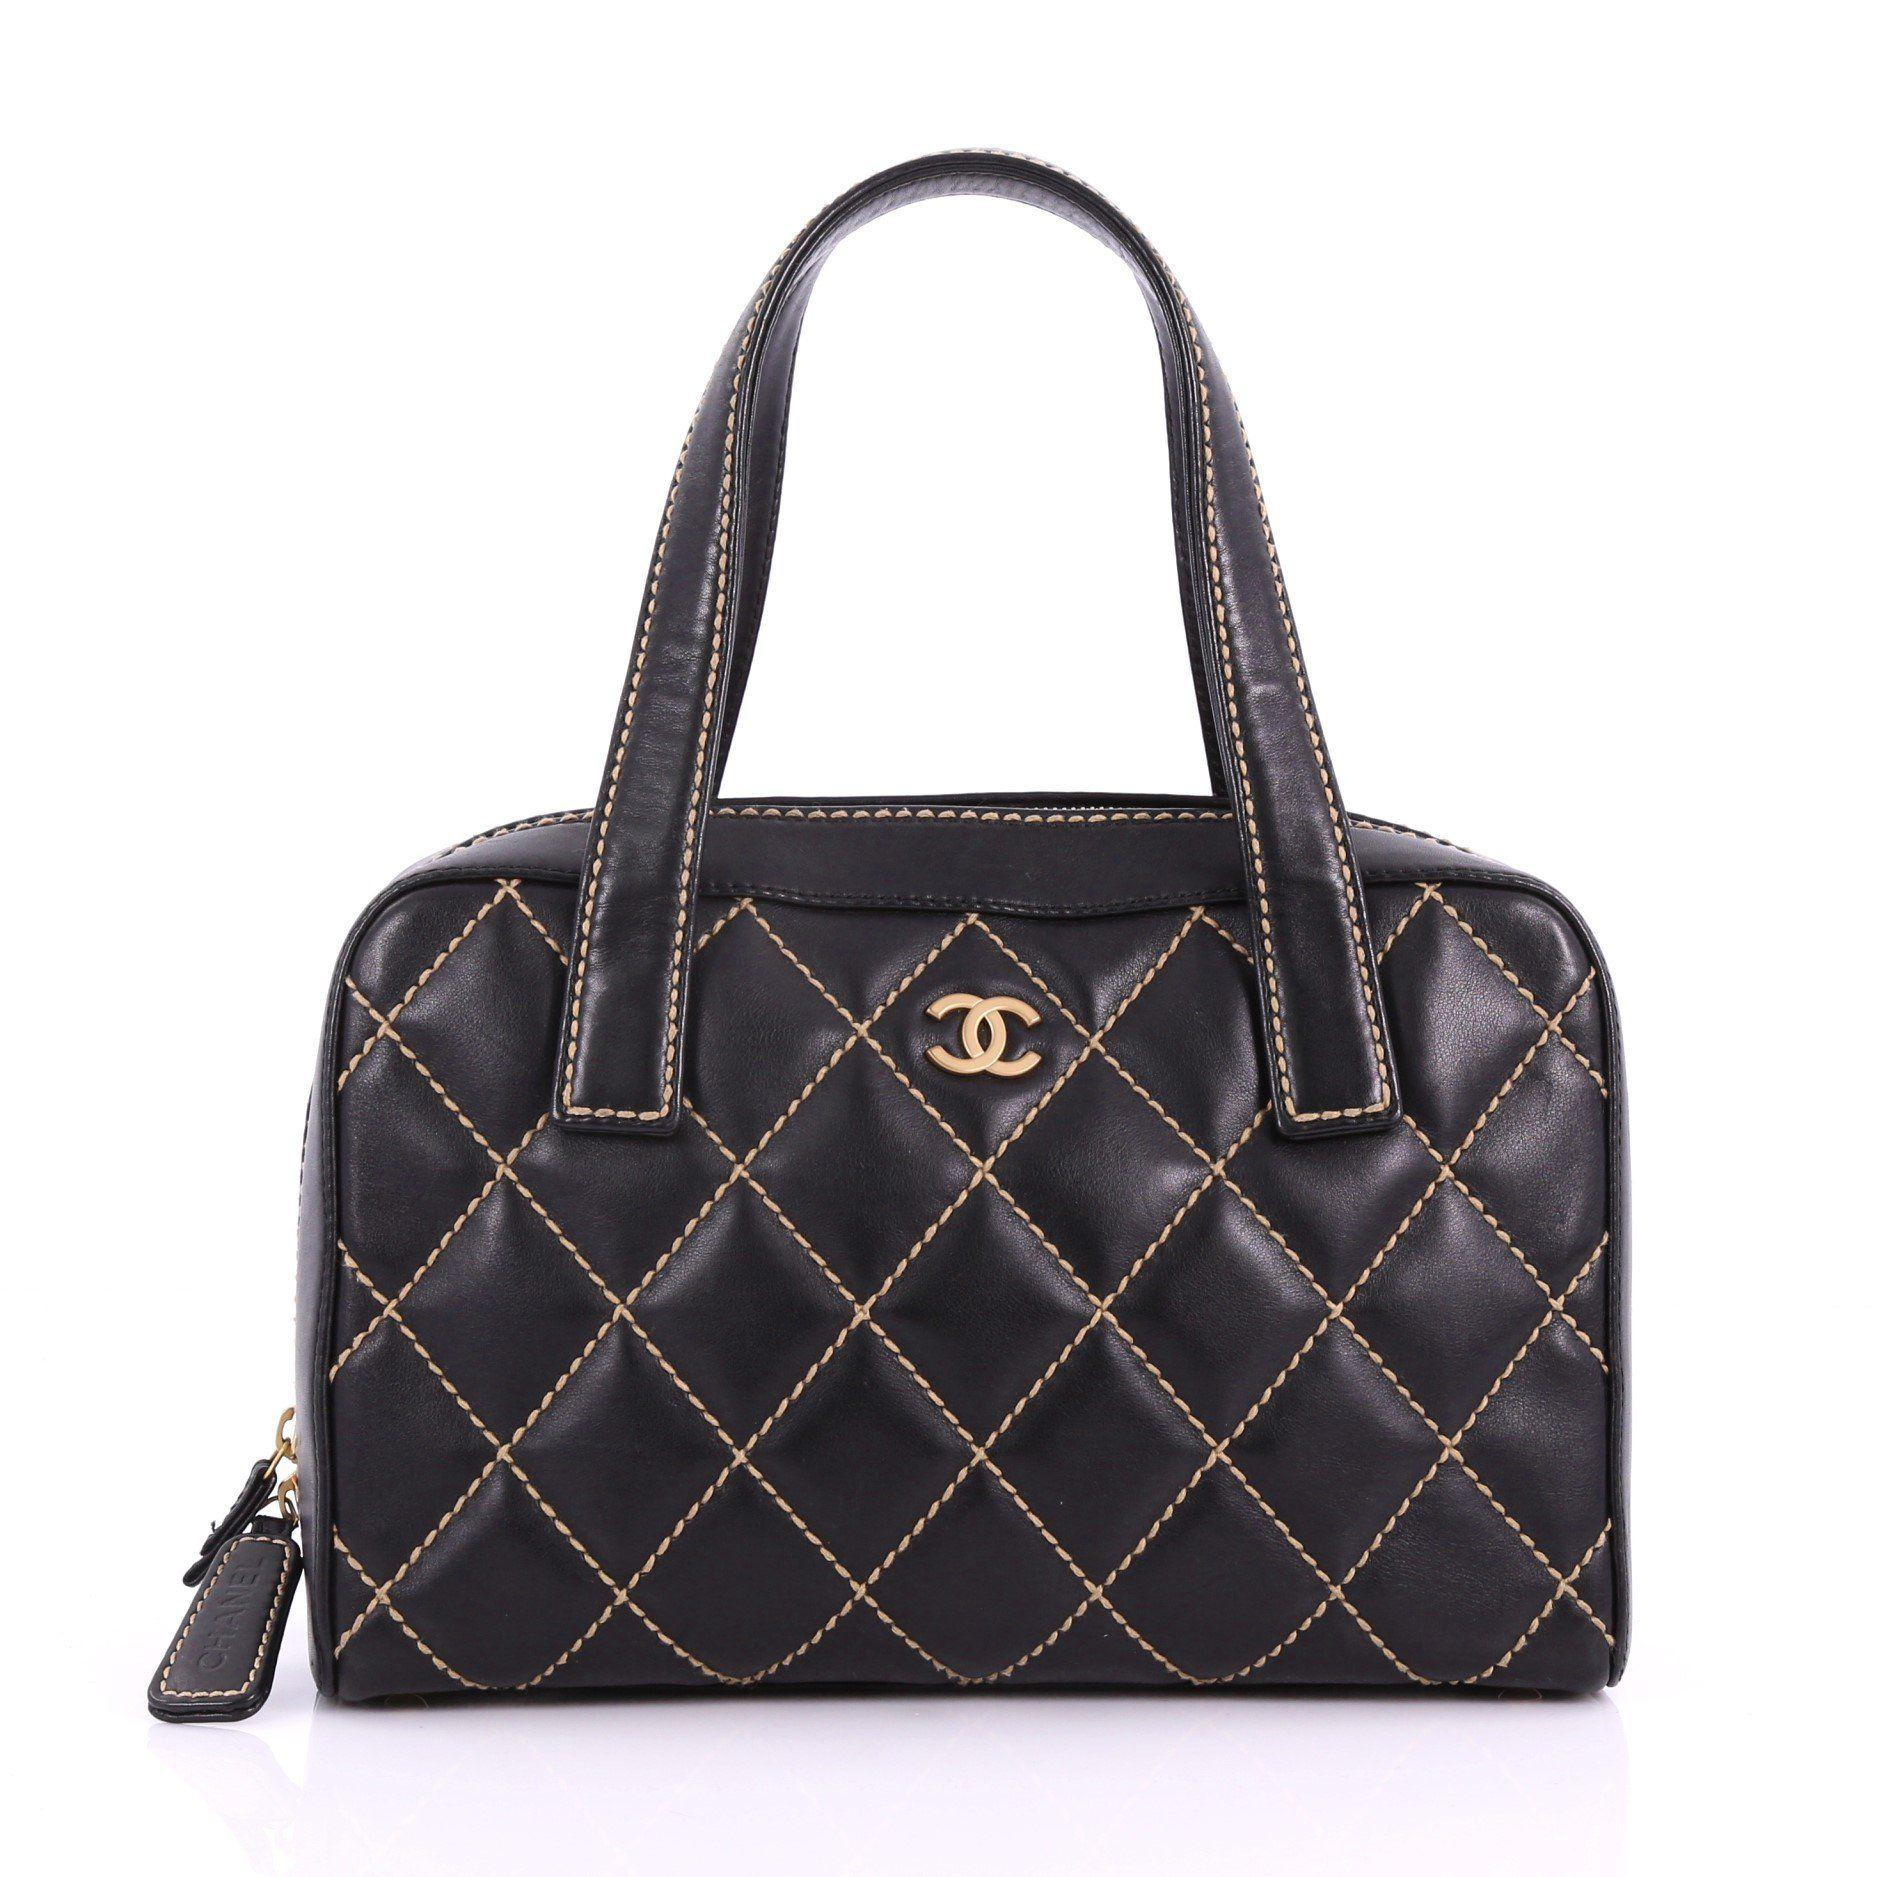 76c34bb5e6edb5 Chanel. Women's Black Pre Owned Surpique Zip Around Satchel Quilted Leather  Medium